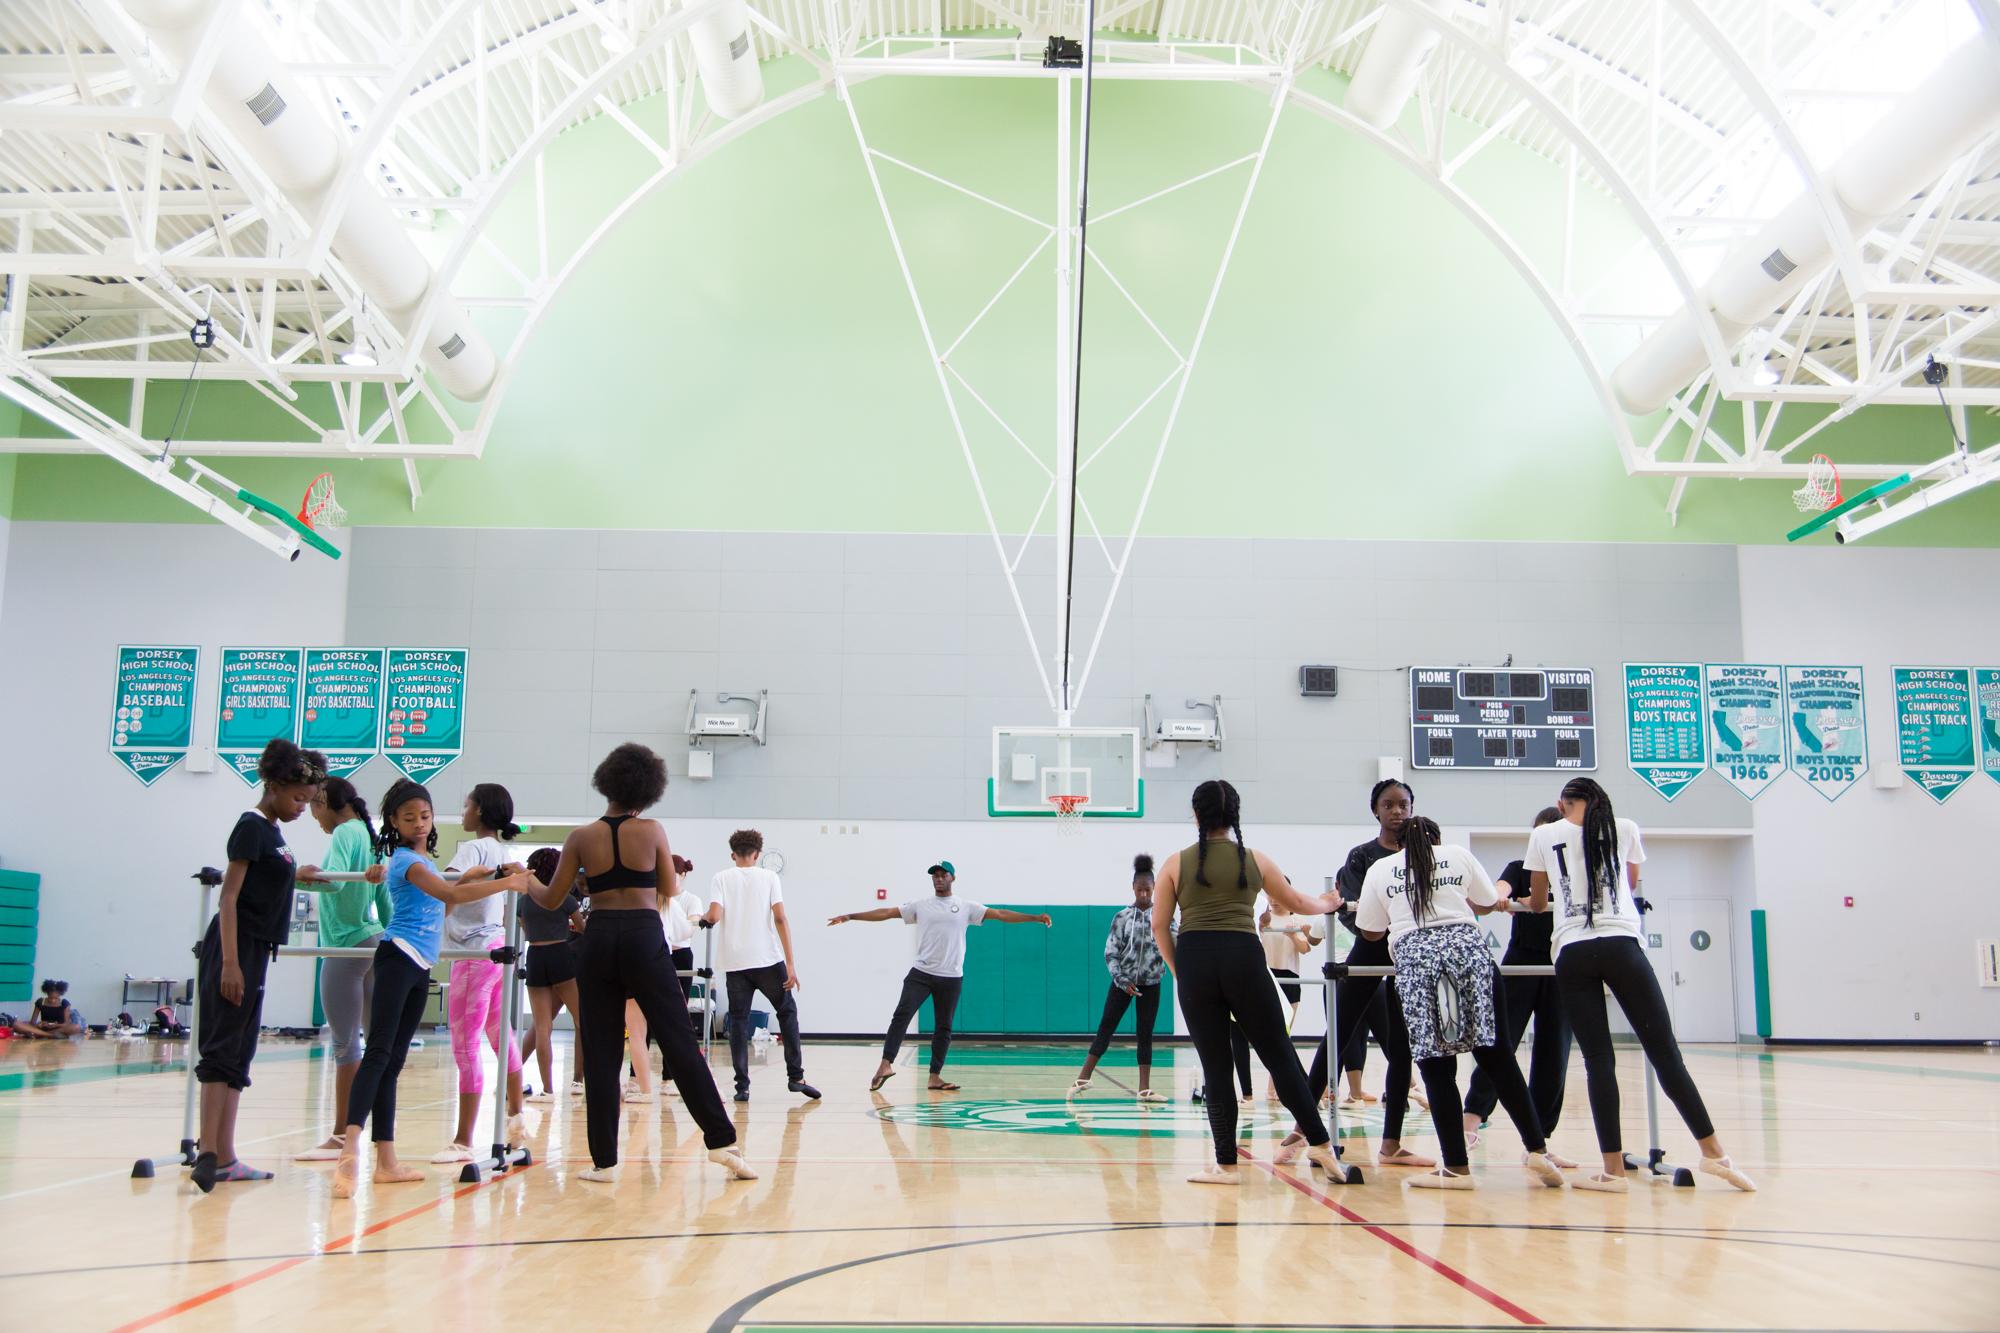 Dorsey High School Dance Class, Los Angeles   Photographed for CAP (Community Arts Partnership)